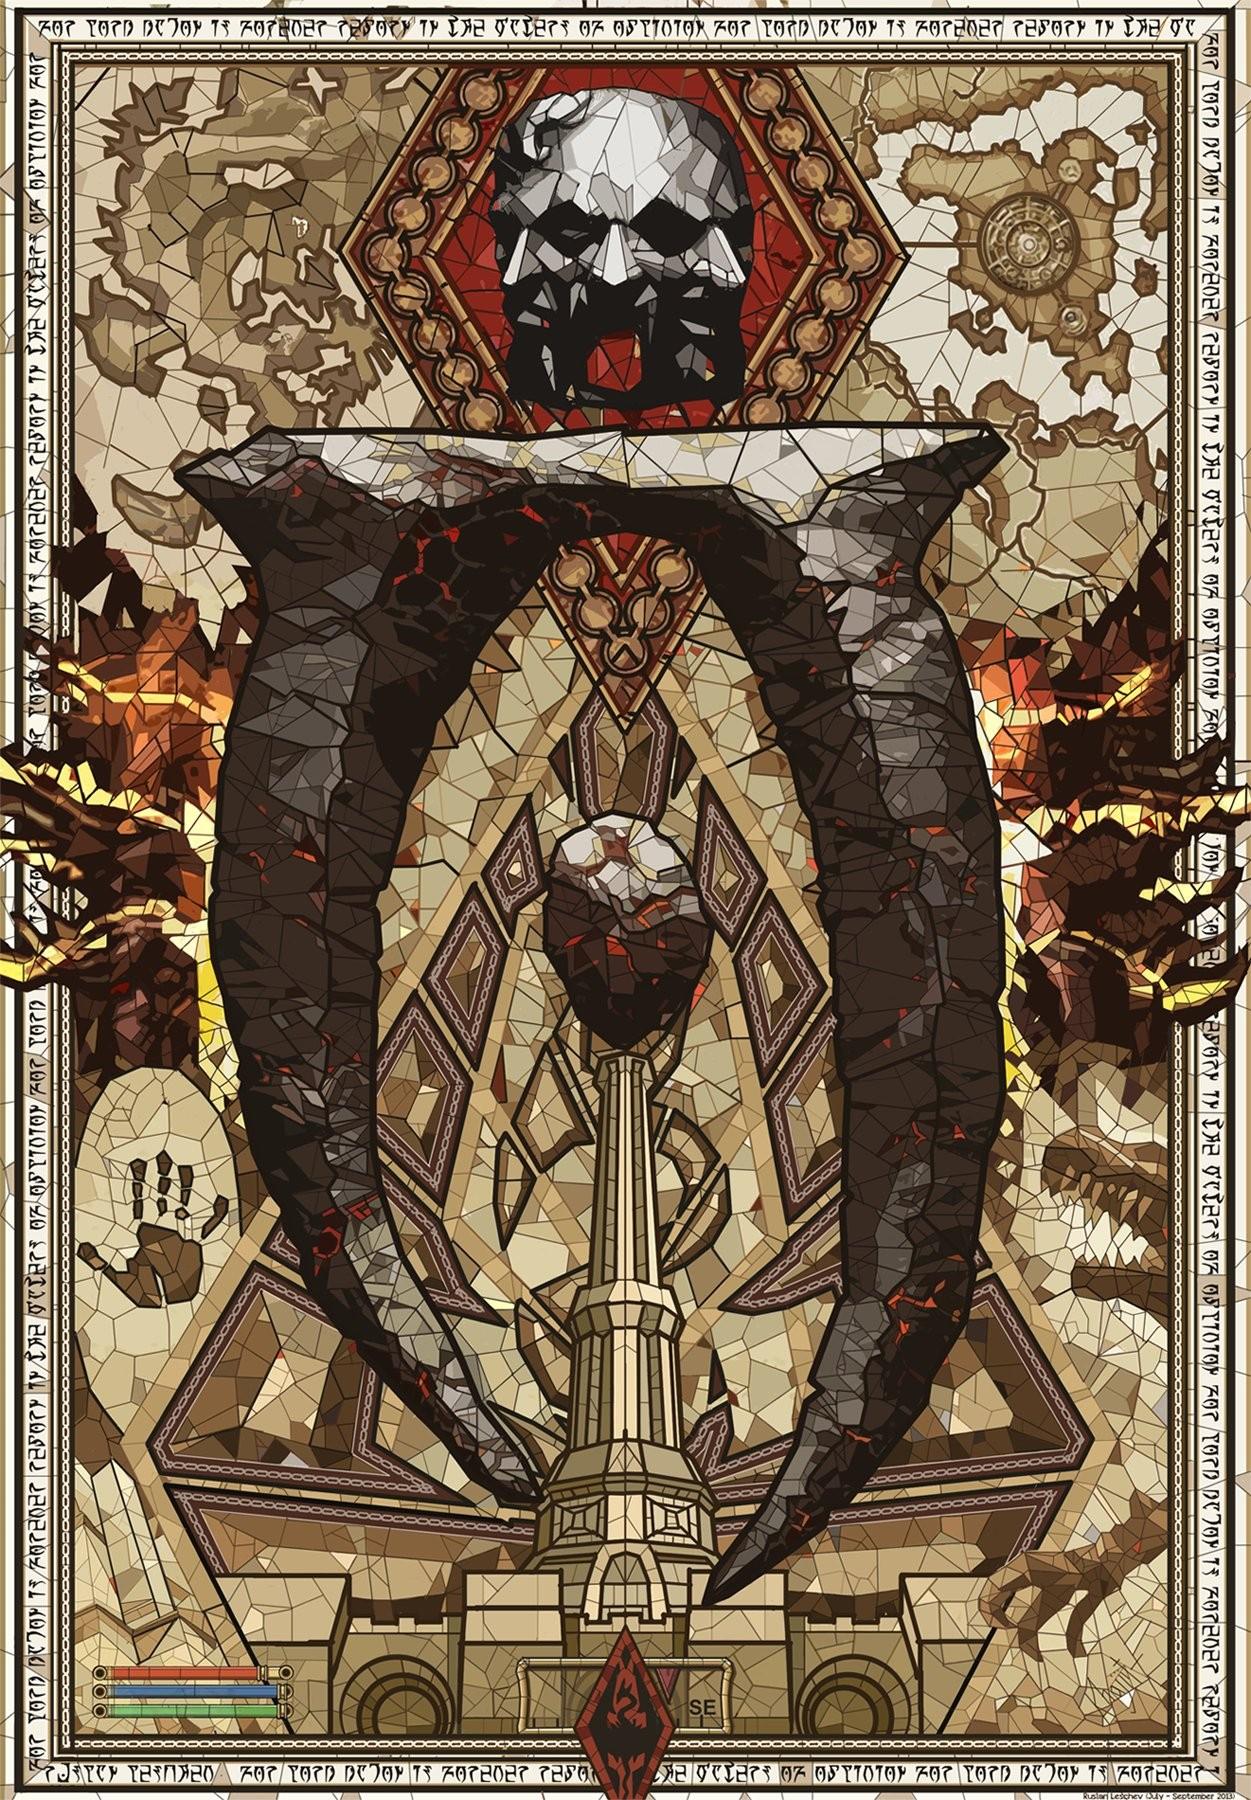 video games, poster, The Elder Scrolls